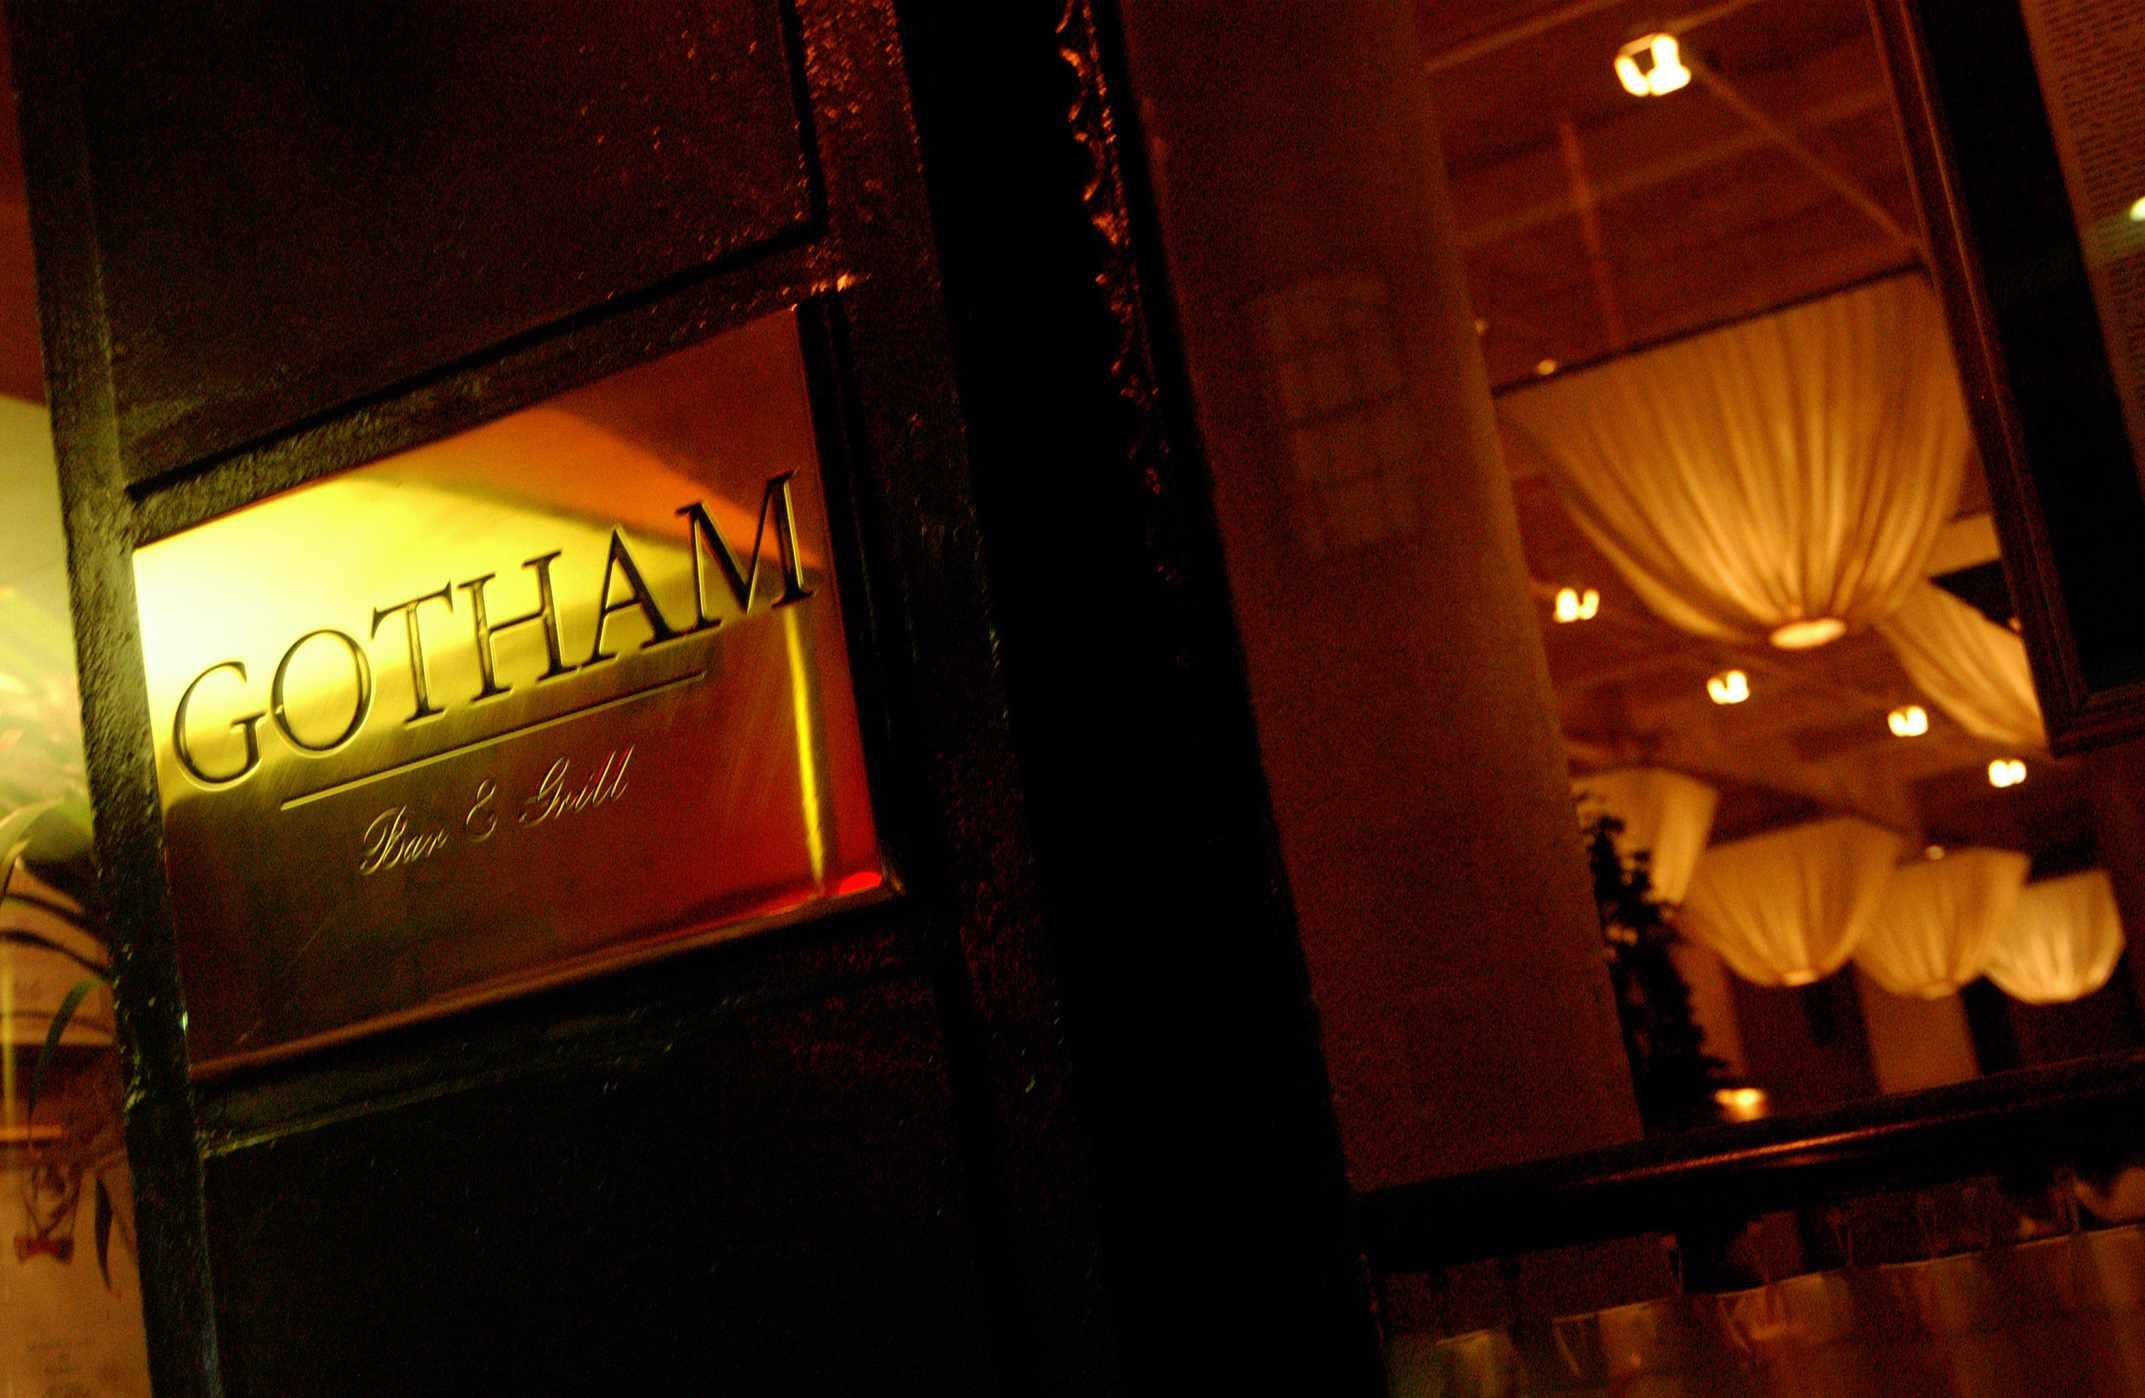 Gotham Bar and Grill, West Village